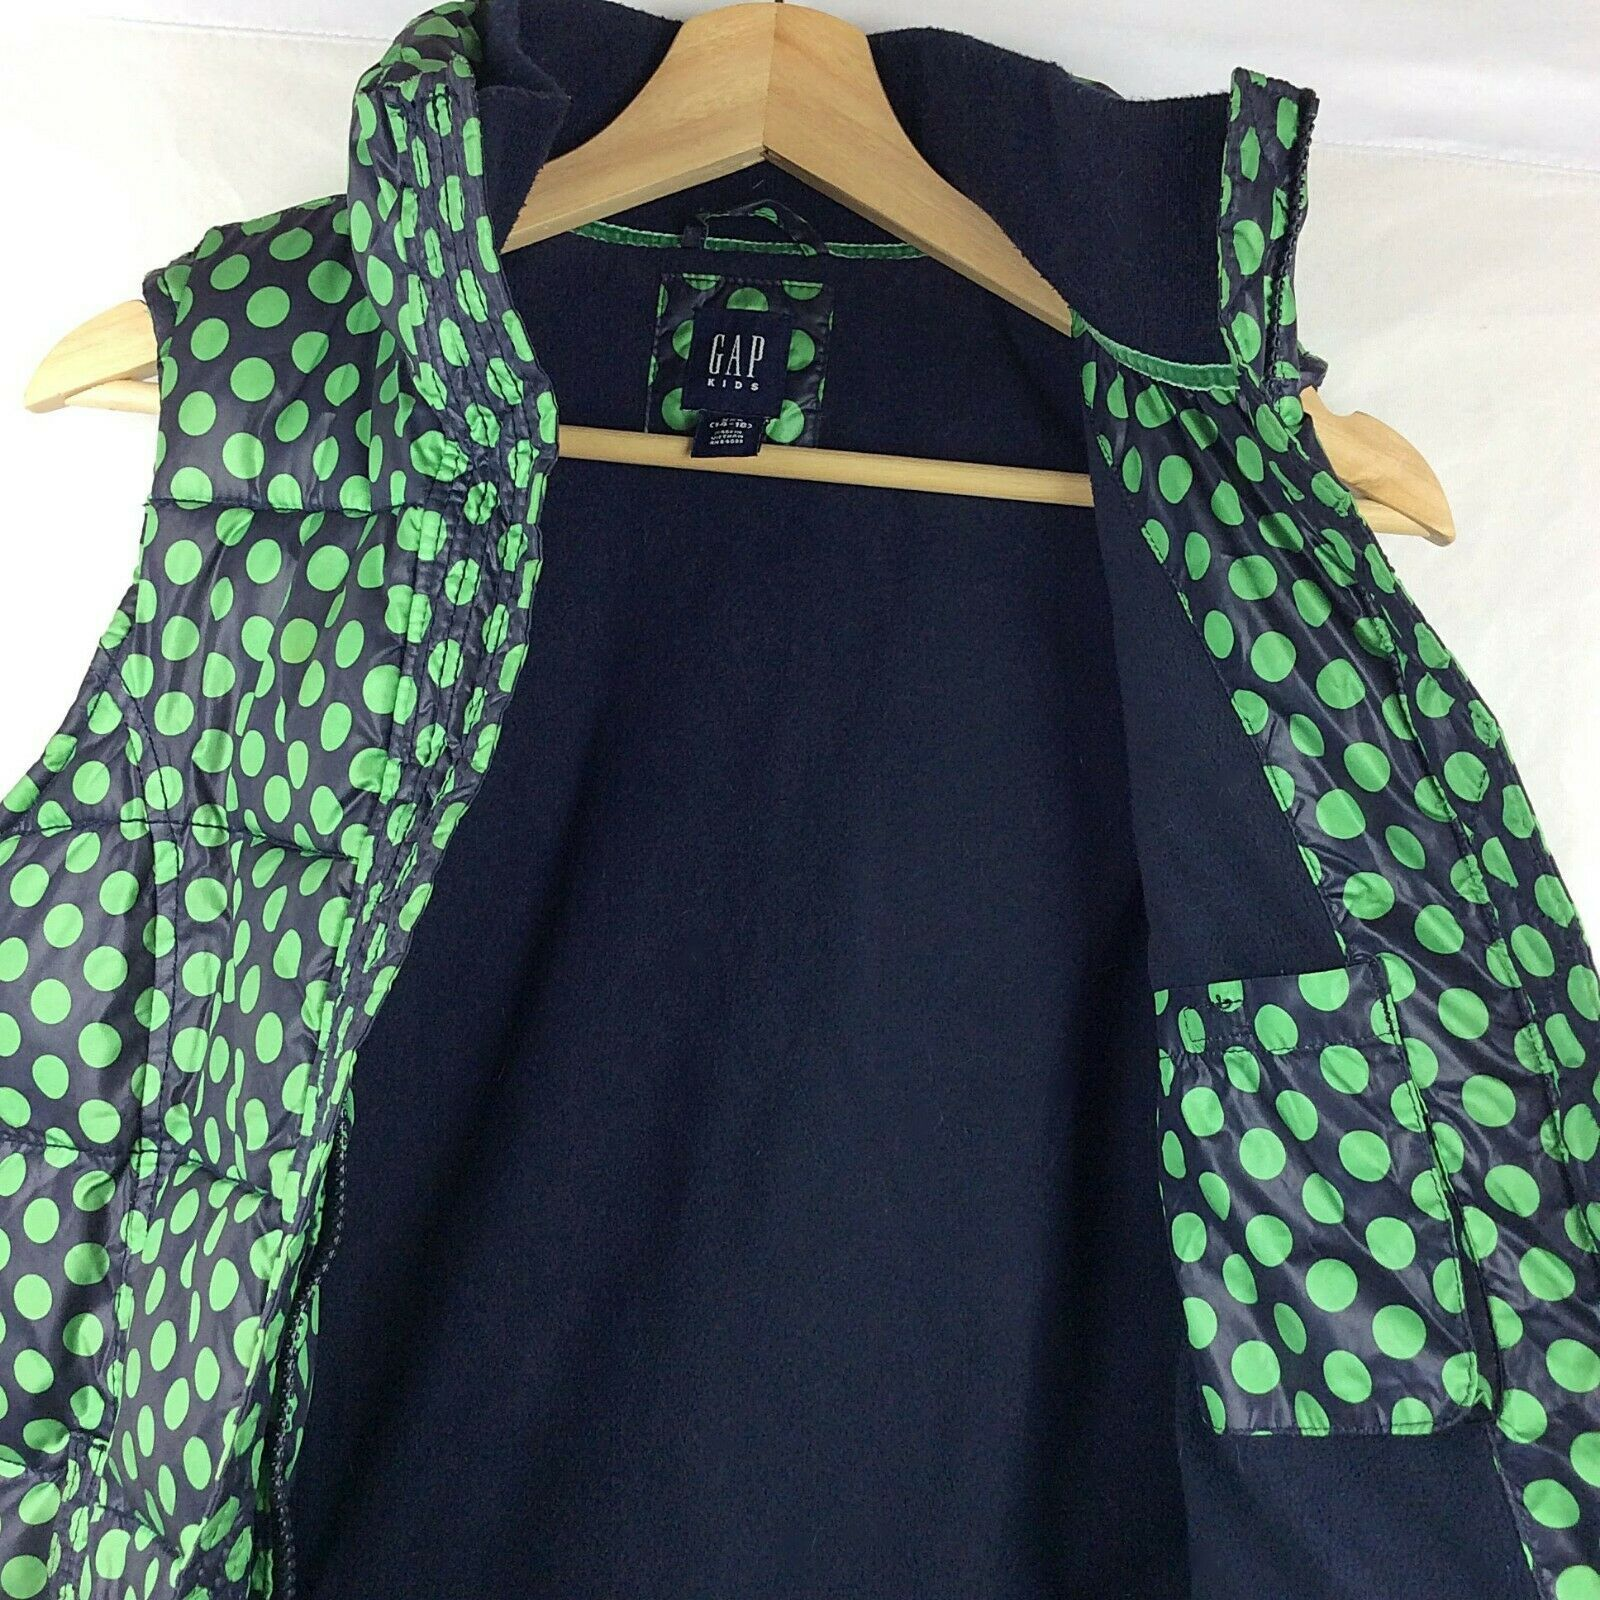 Gap Kids Girls Puffer Vest XL 14 16 Navy Blue Green Polka Dot Thick Quilted